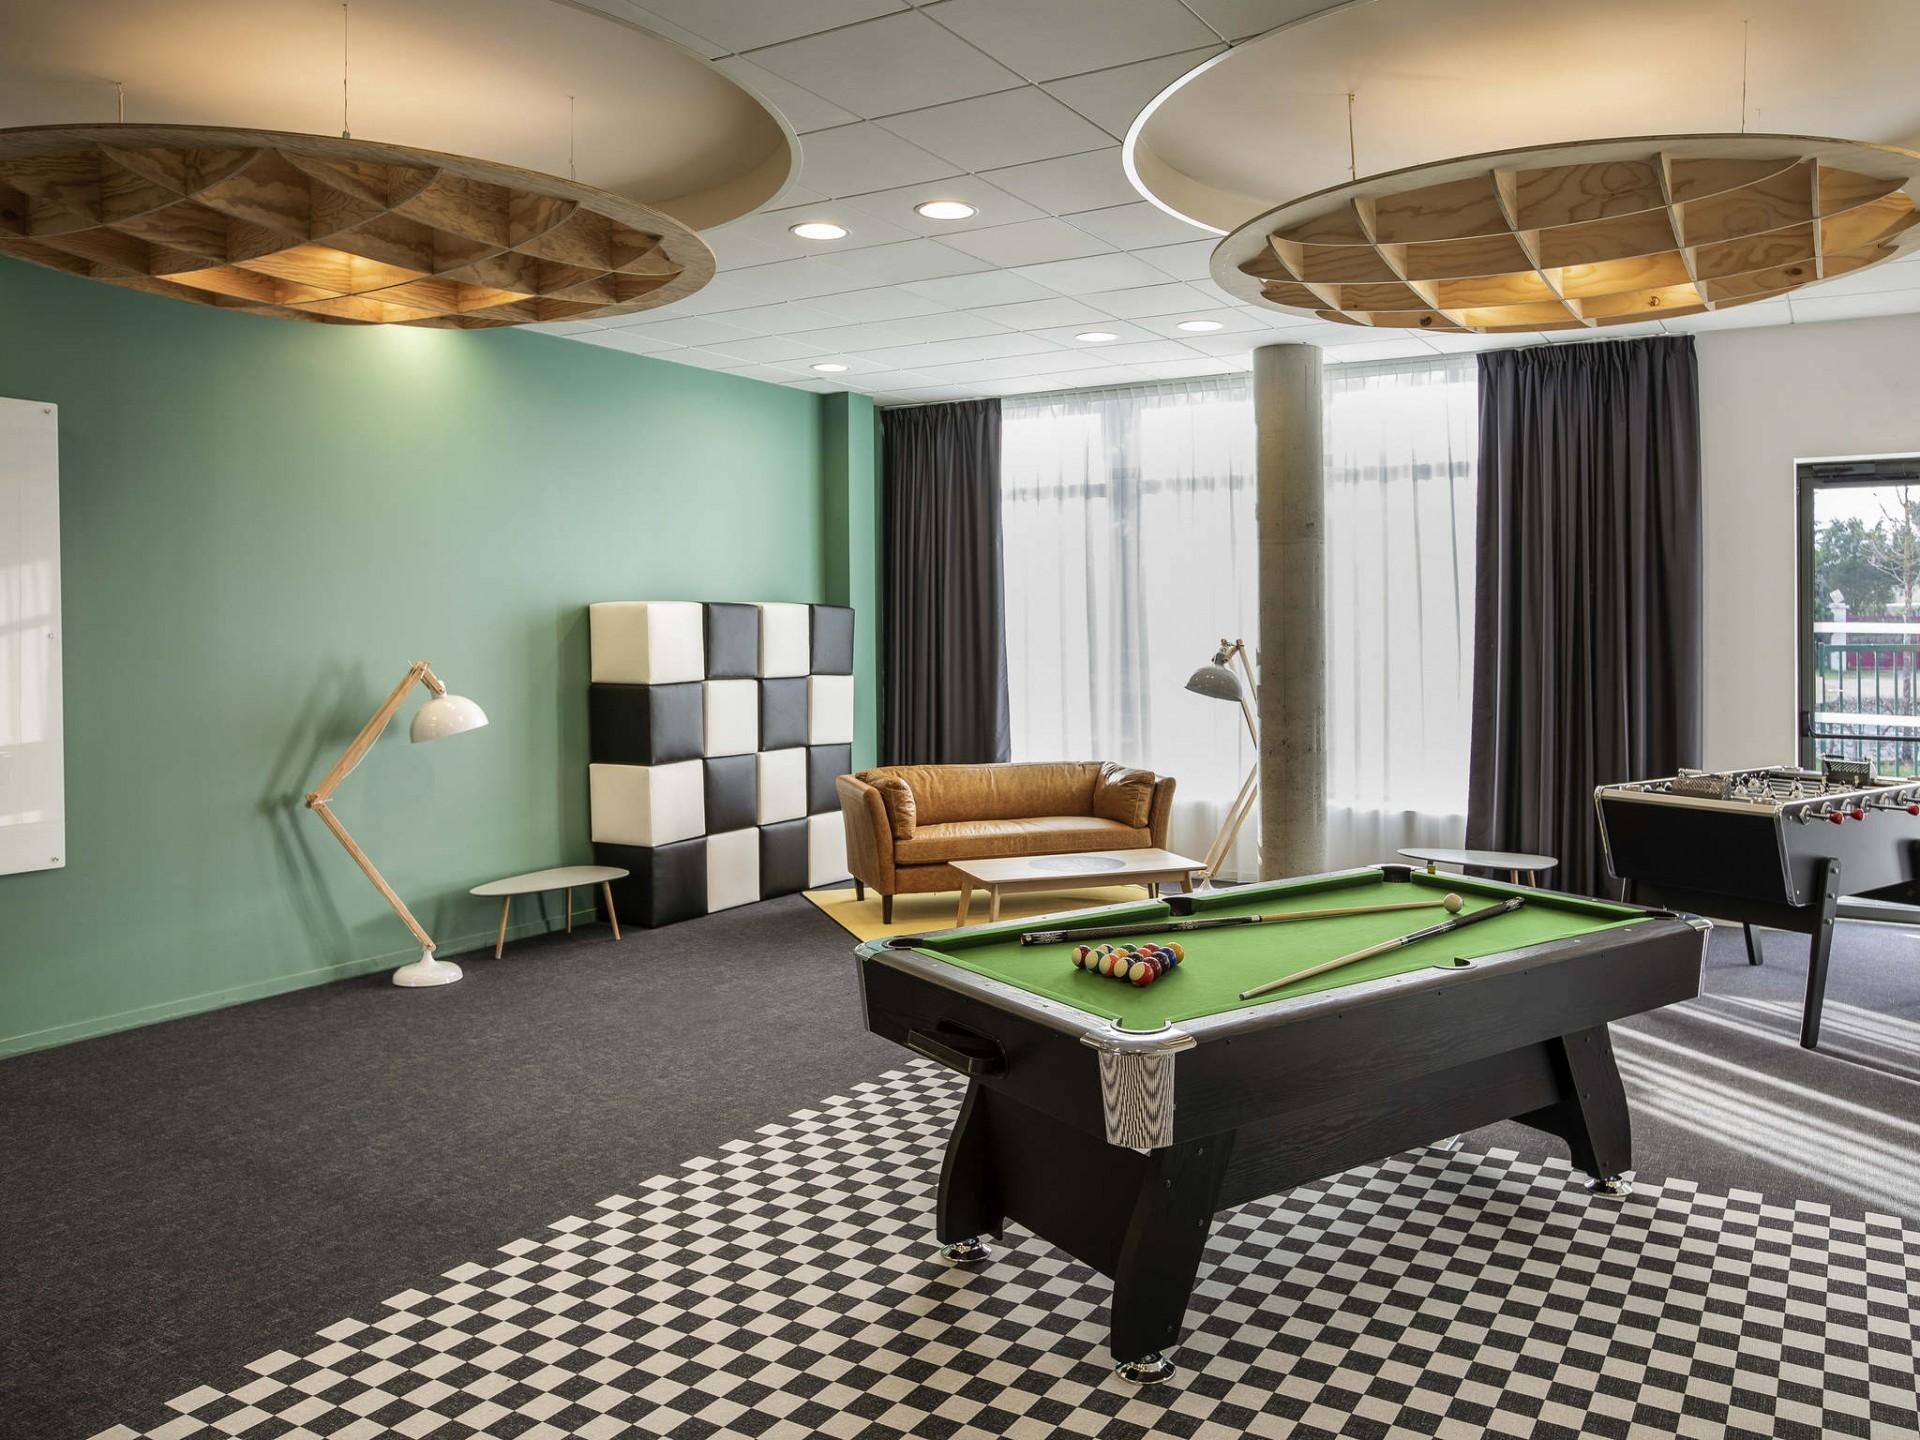 billard-room-hotel-circuit-24-hours